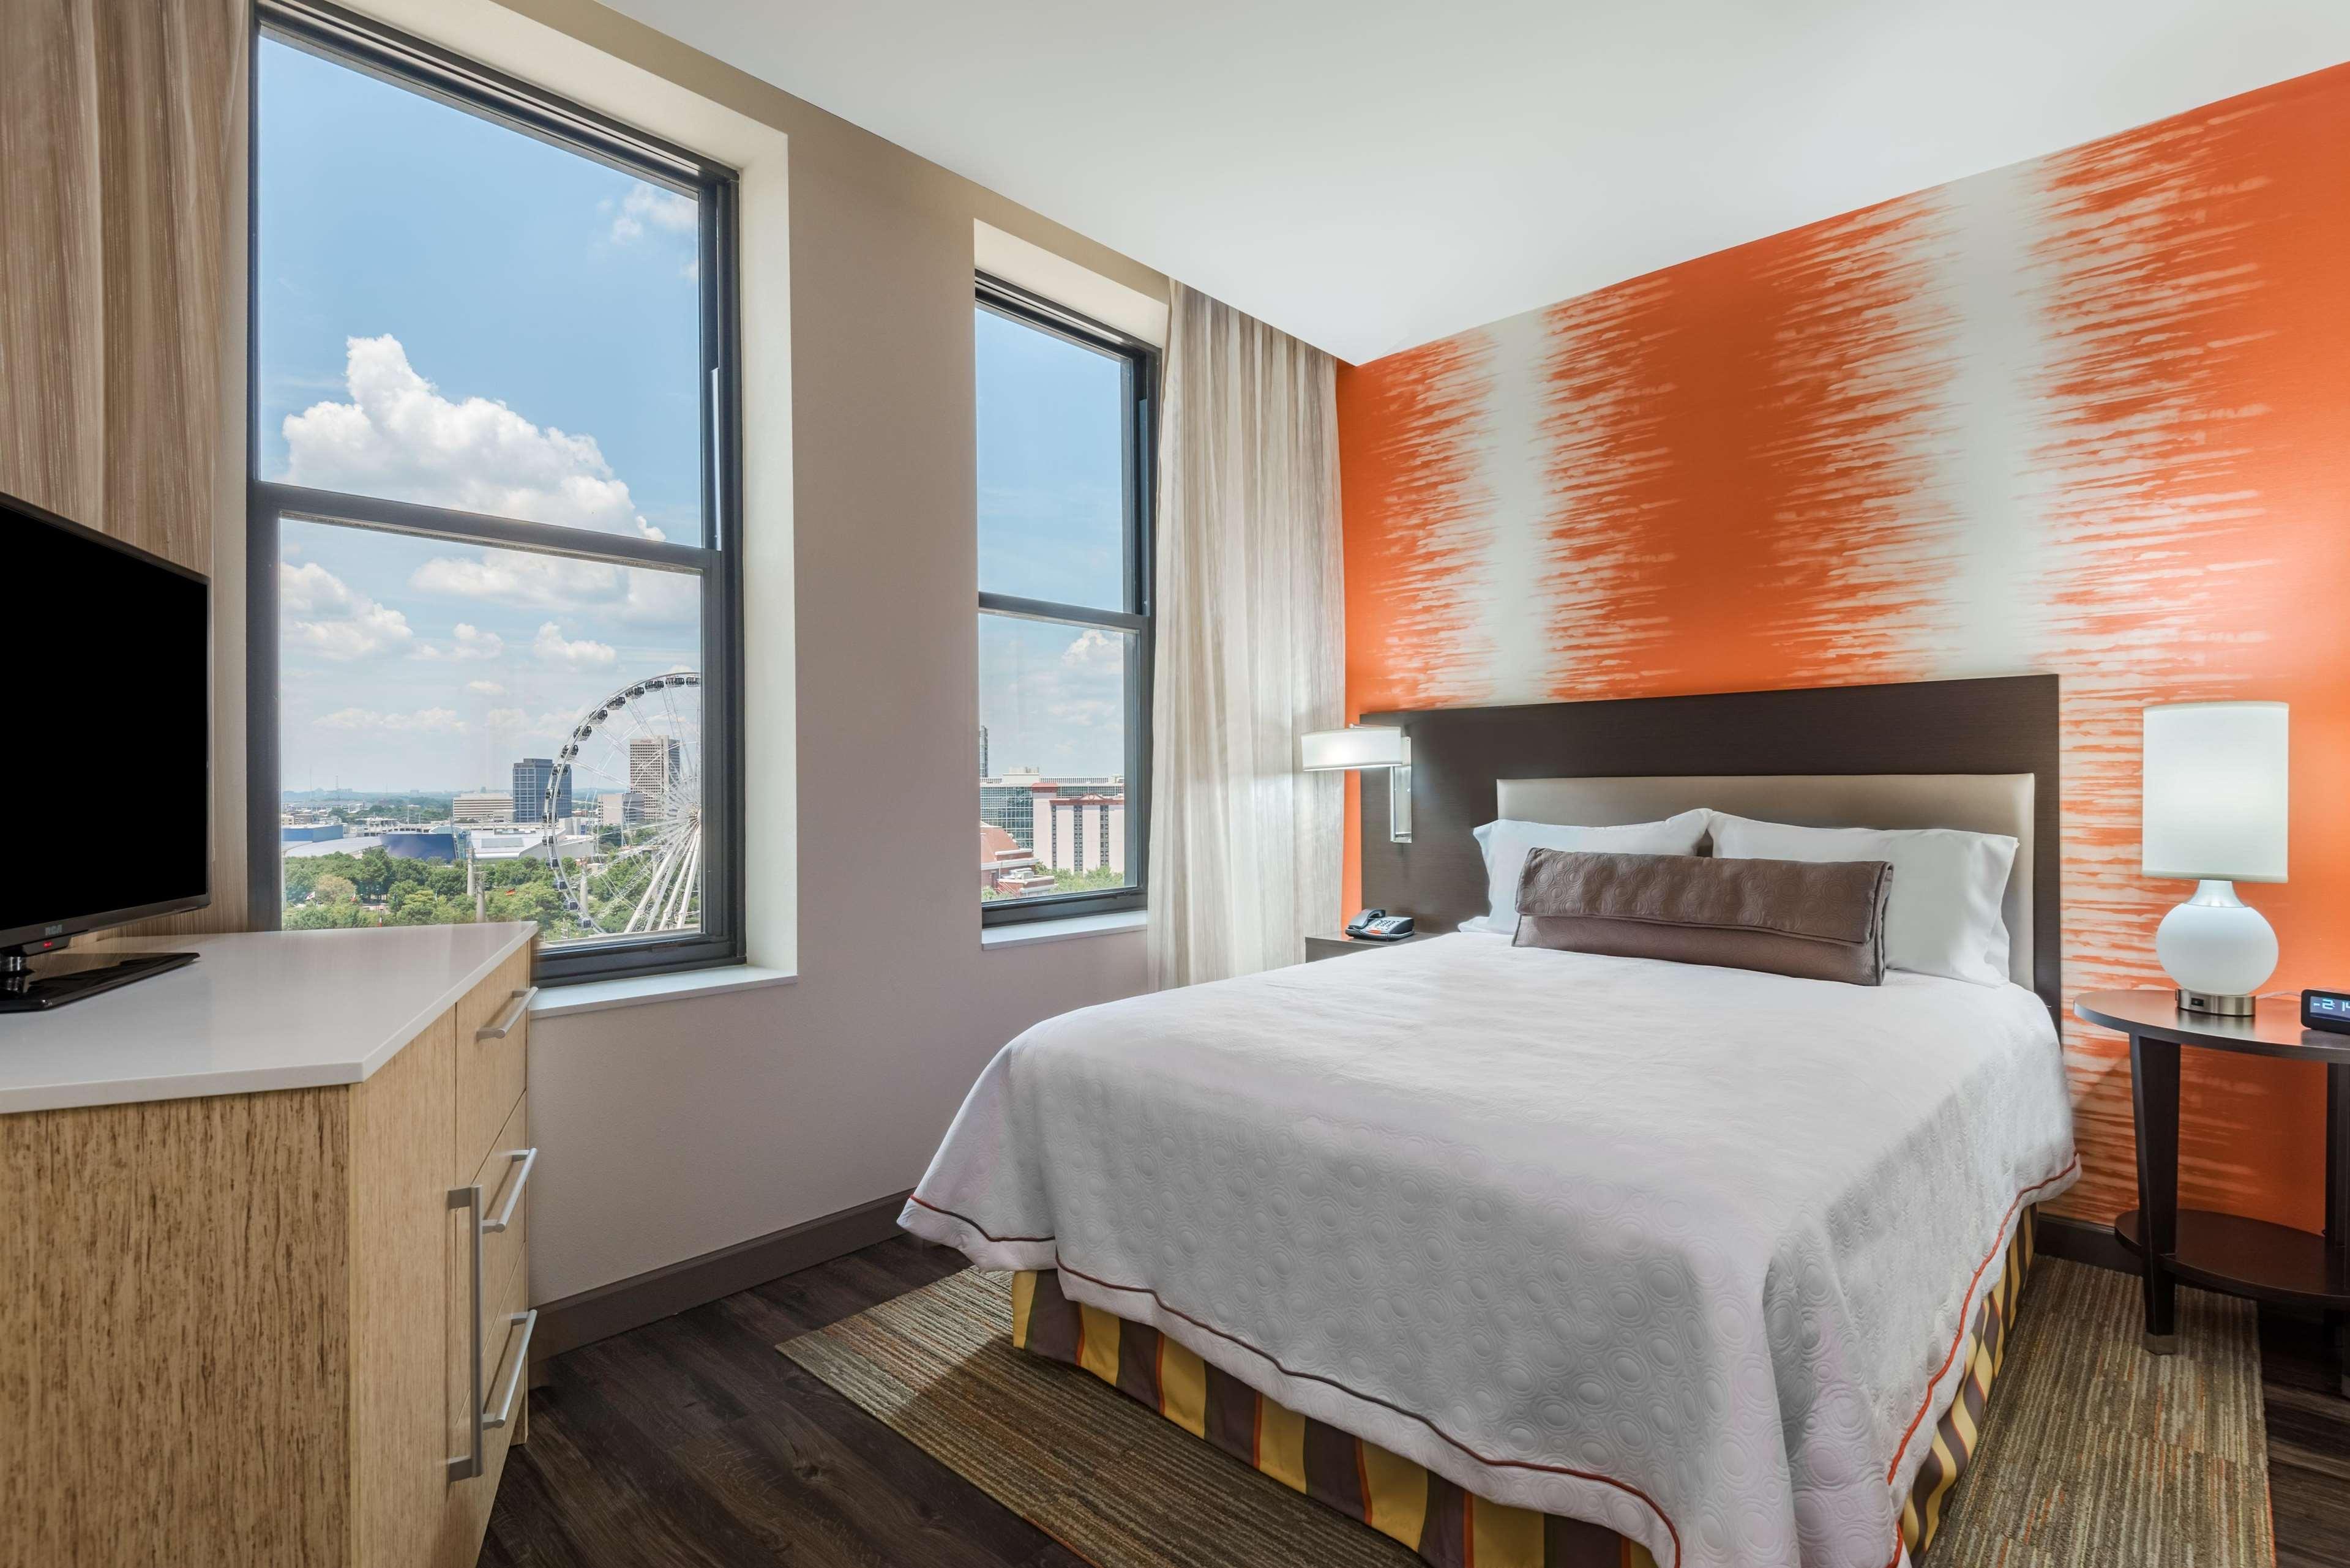 Home2 Suites by Hilton Atlanta Downtown image 23